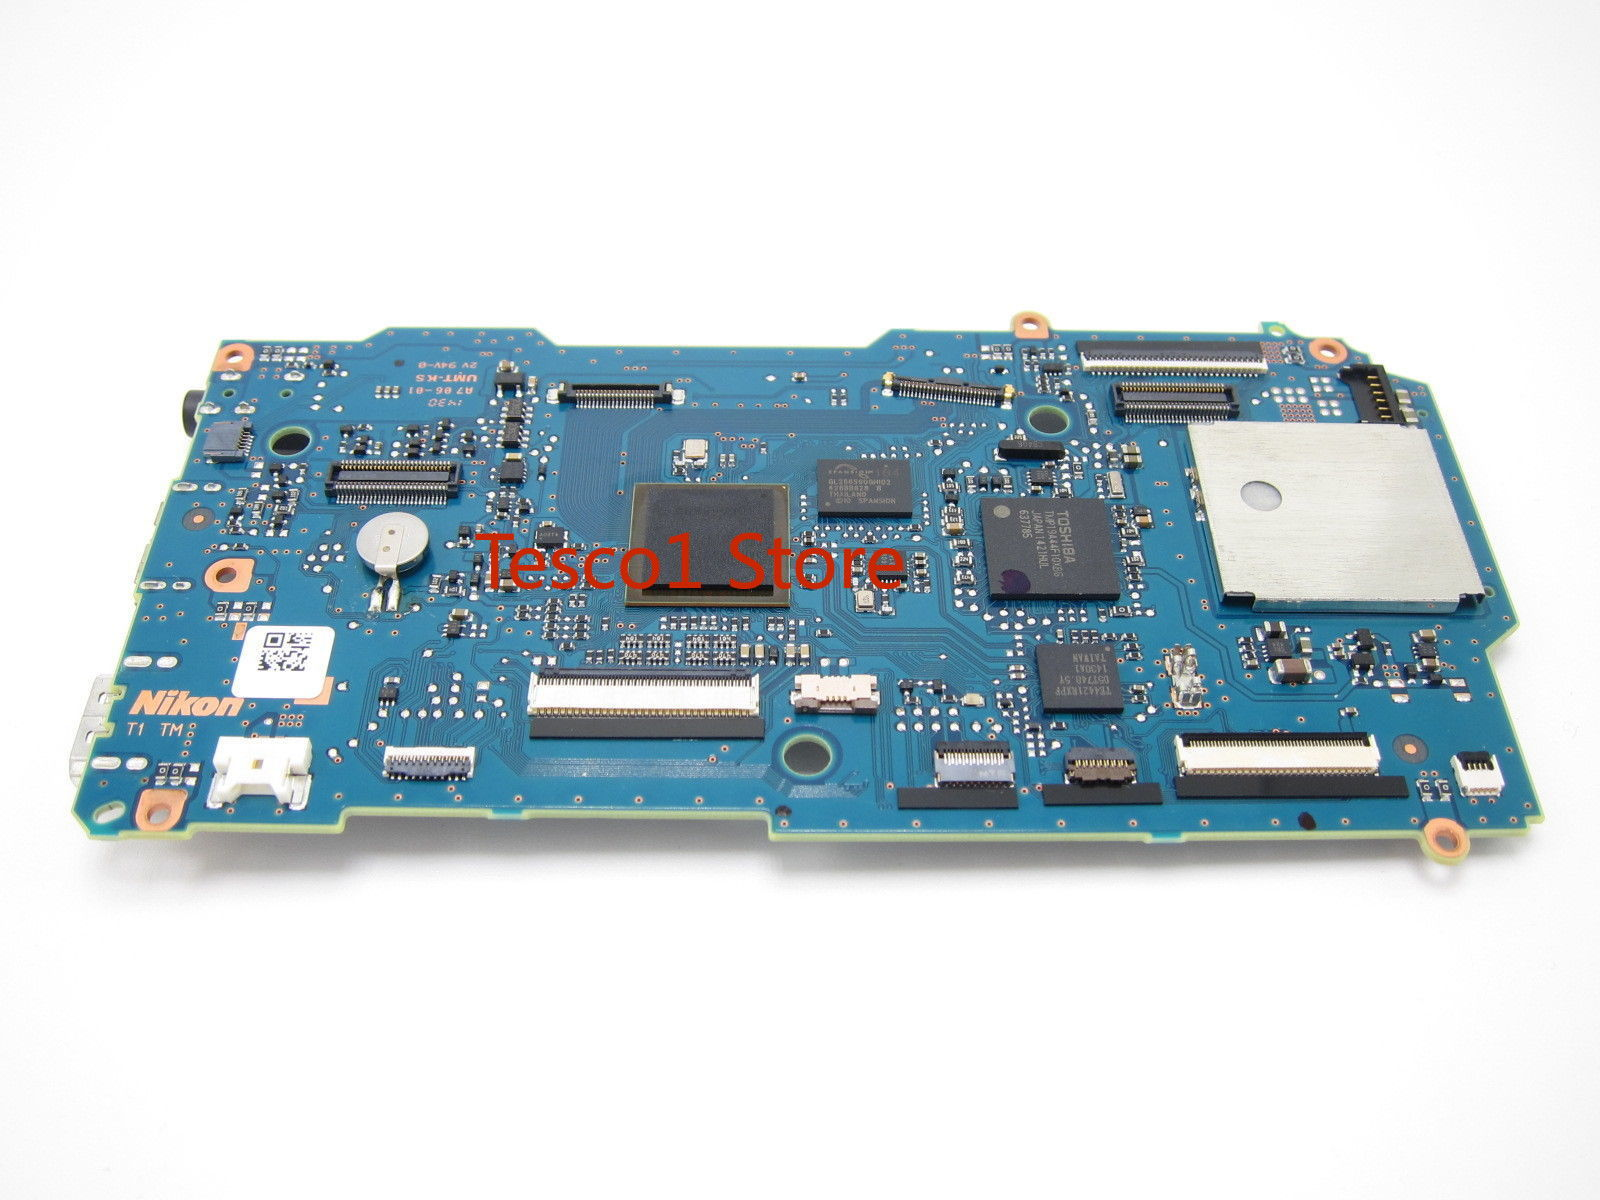 Brand new original camera parts For Nikon D810 Main Board Motherboard MCU PCB Digital Board